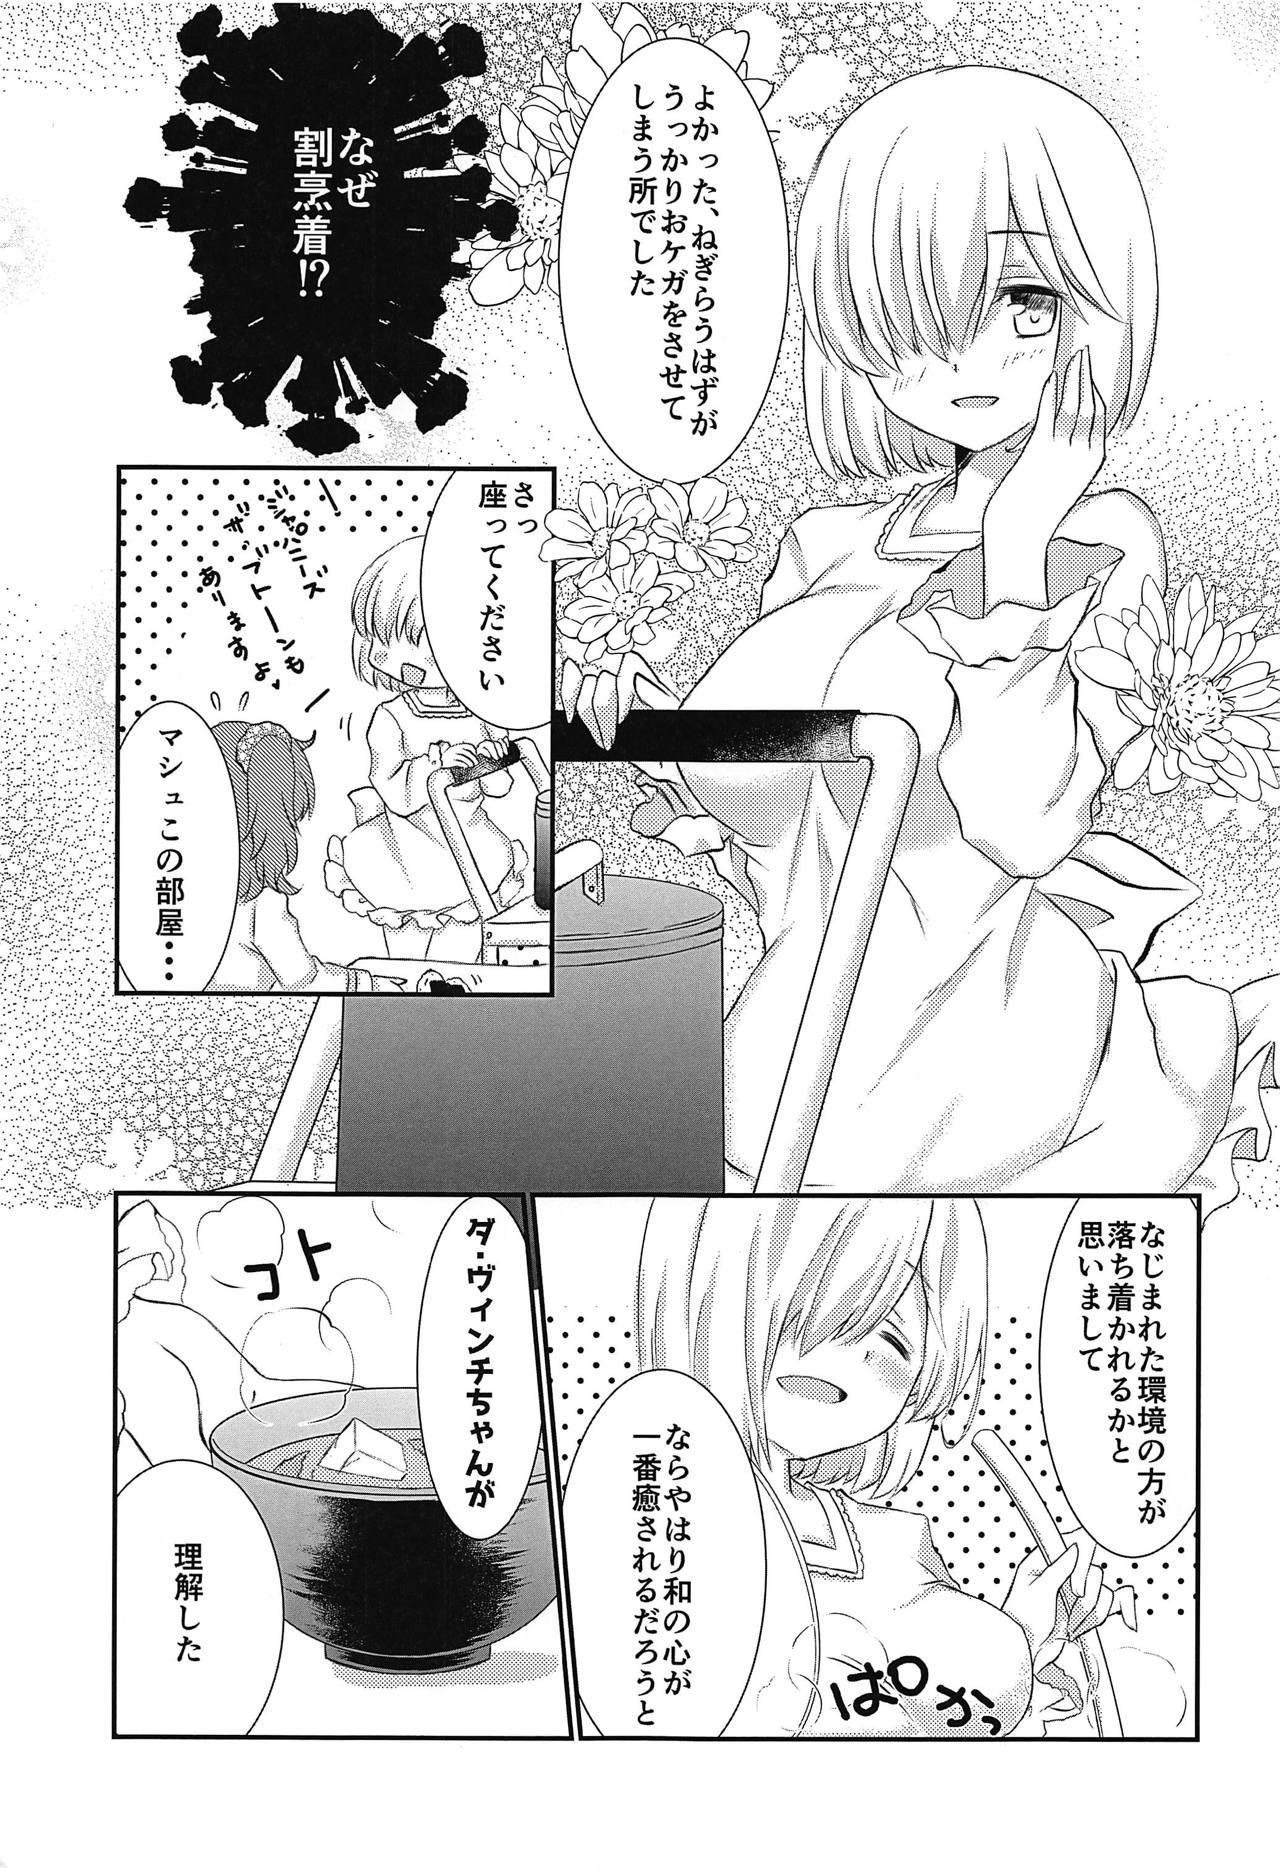 Purutto Mash-chan 2 7